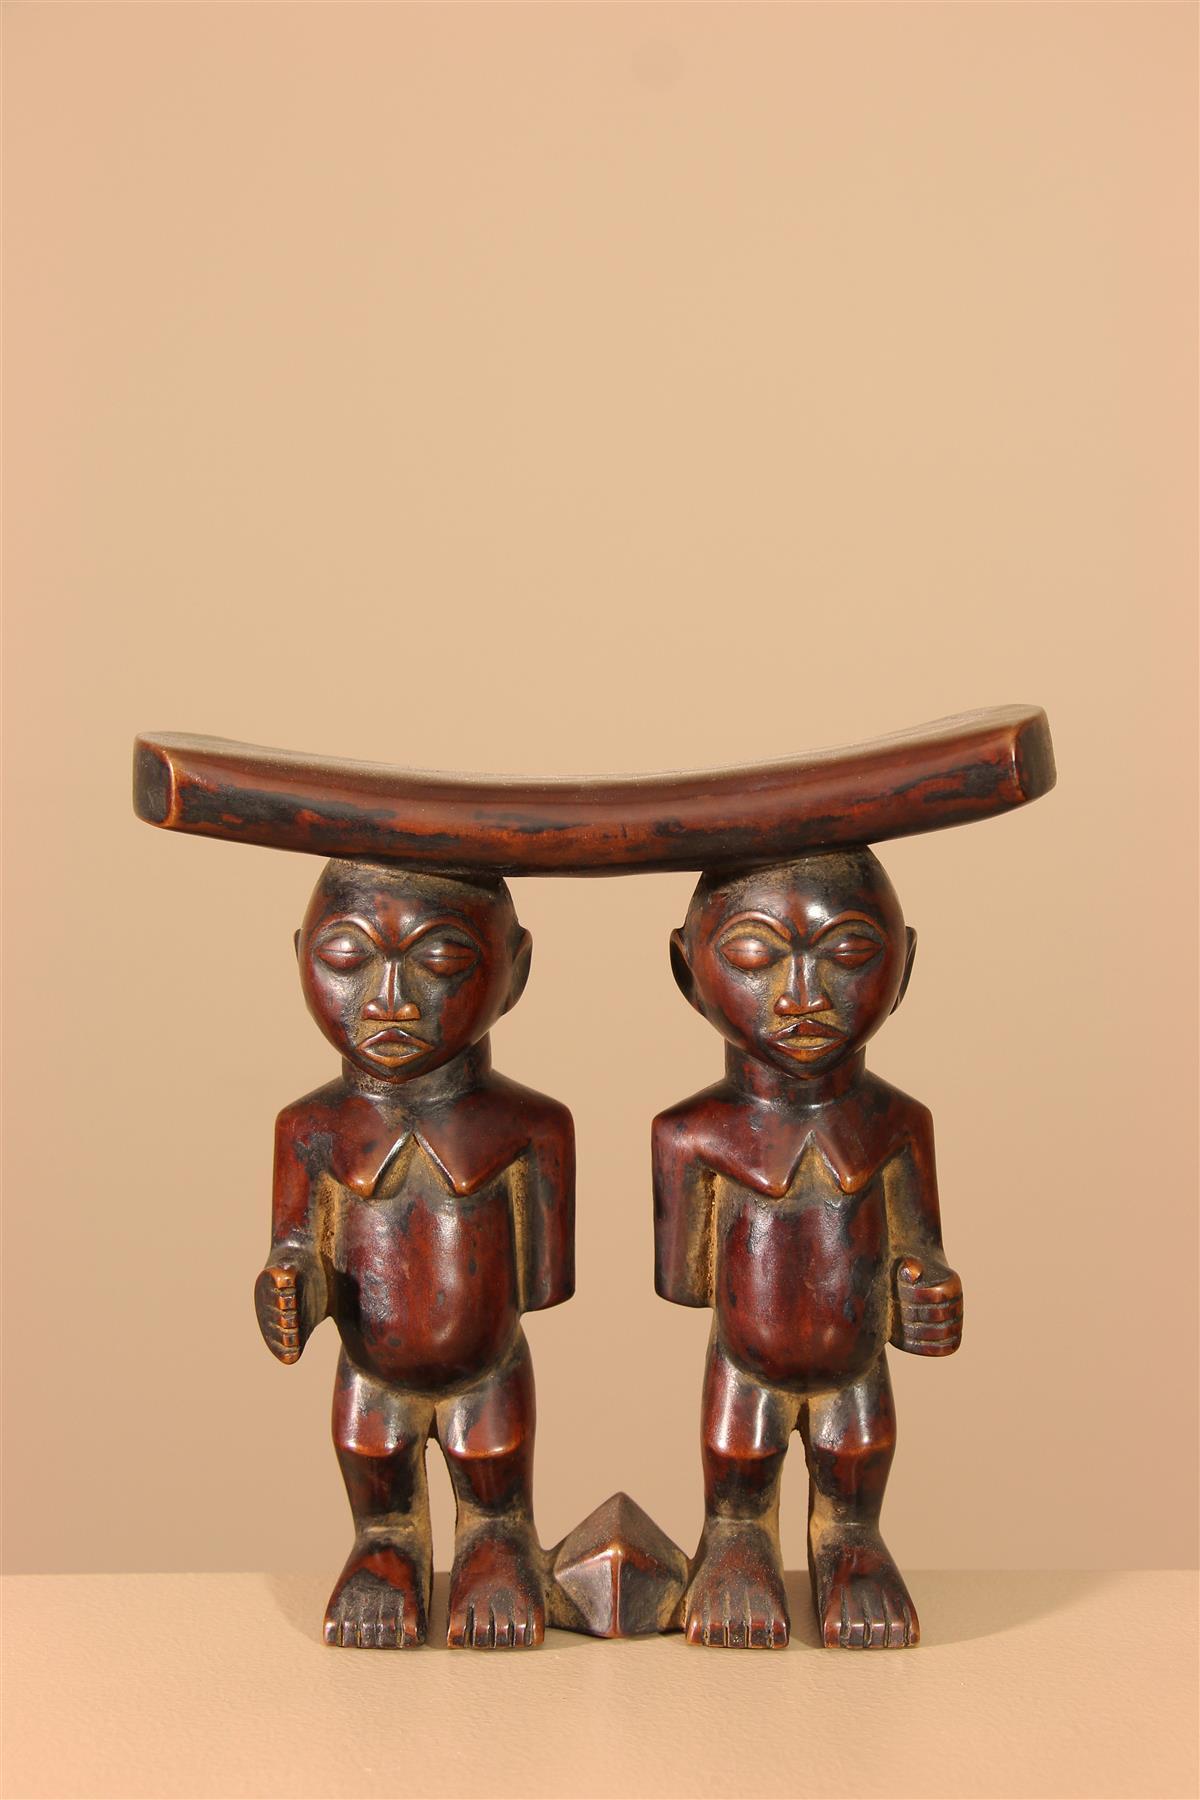 Appuie-nuque tribal - Déco africaine - Art africain traditionnel